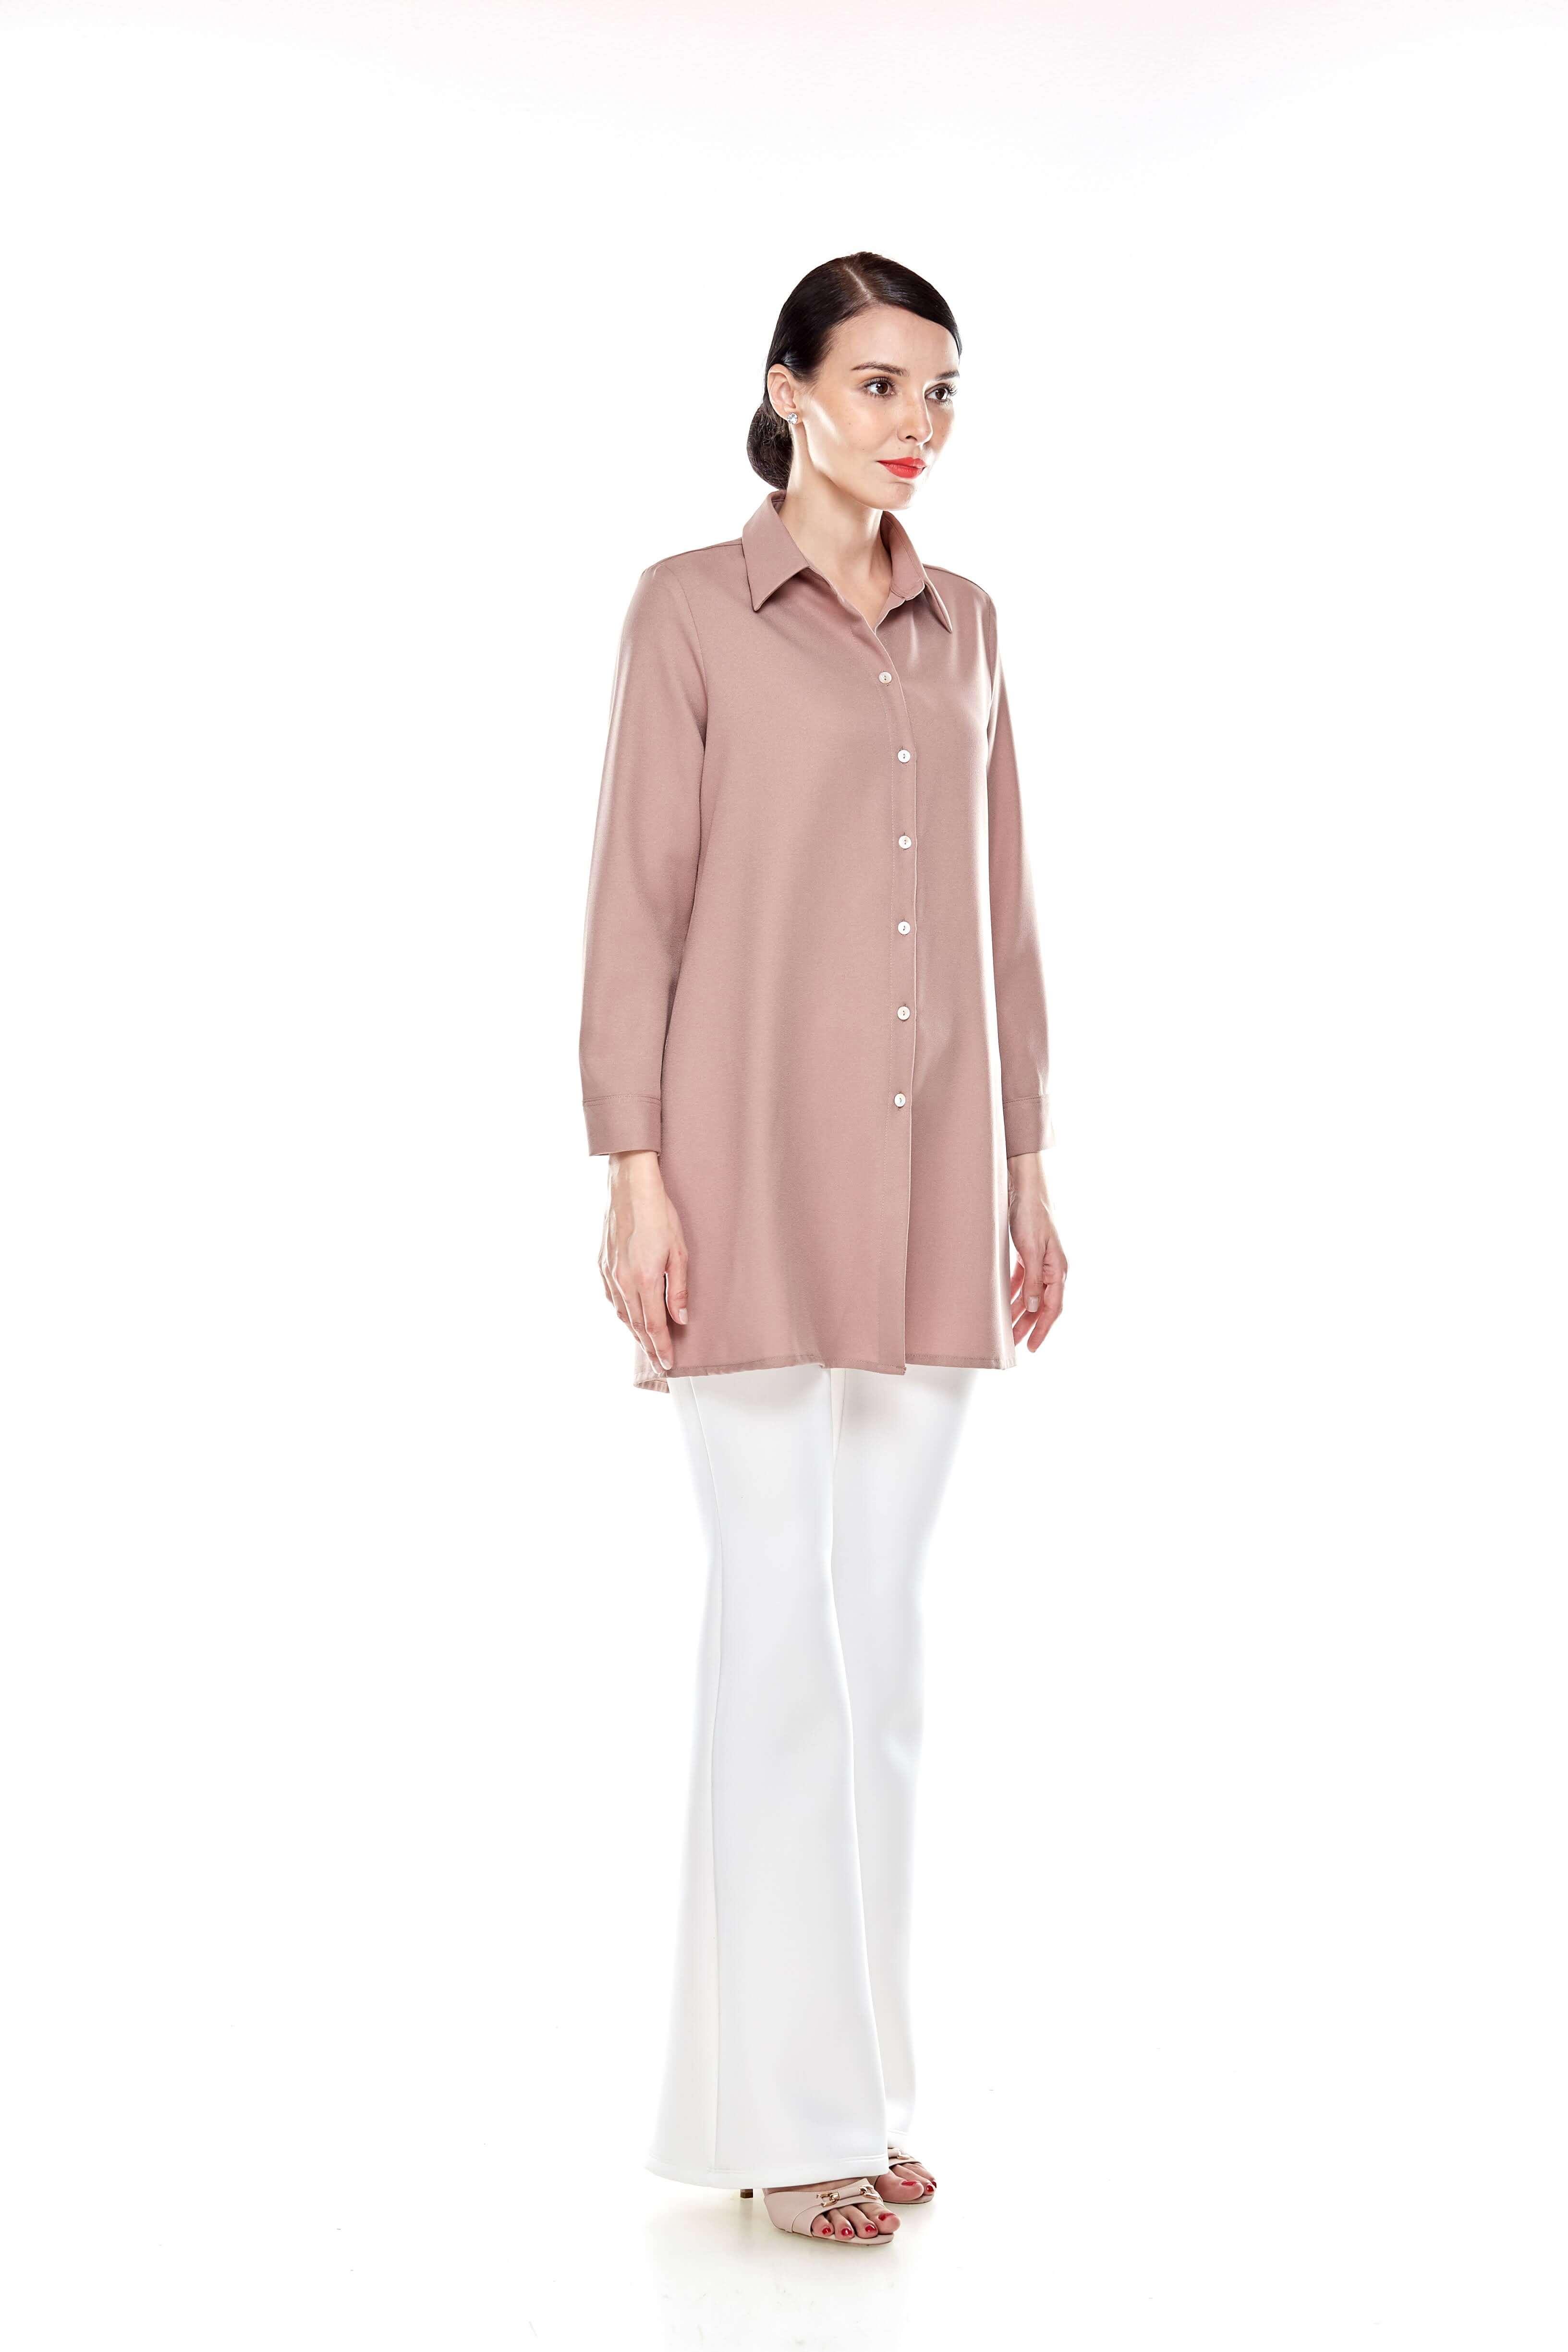 Warm Taupe Shirt Blouse (7)